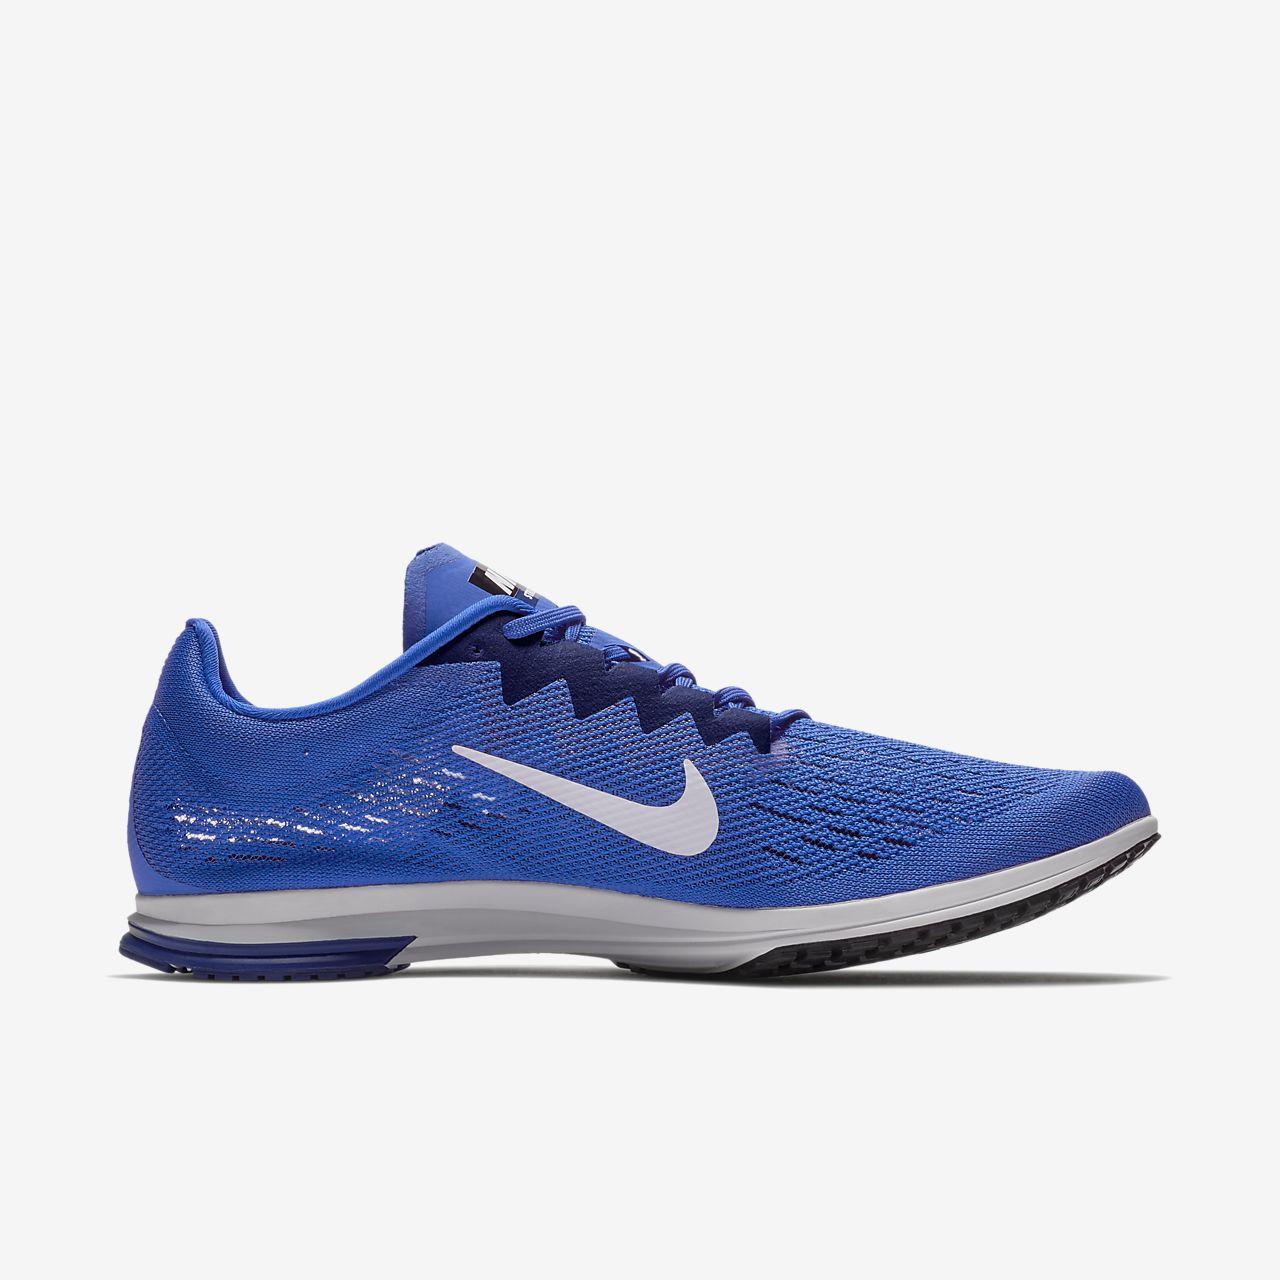 7 Best Nike Racing Shoes